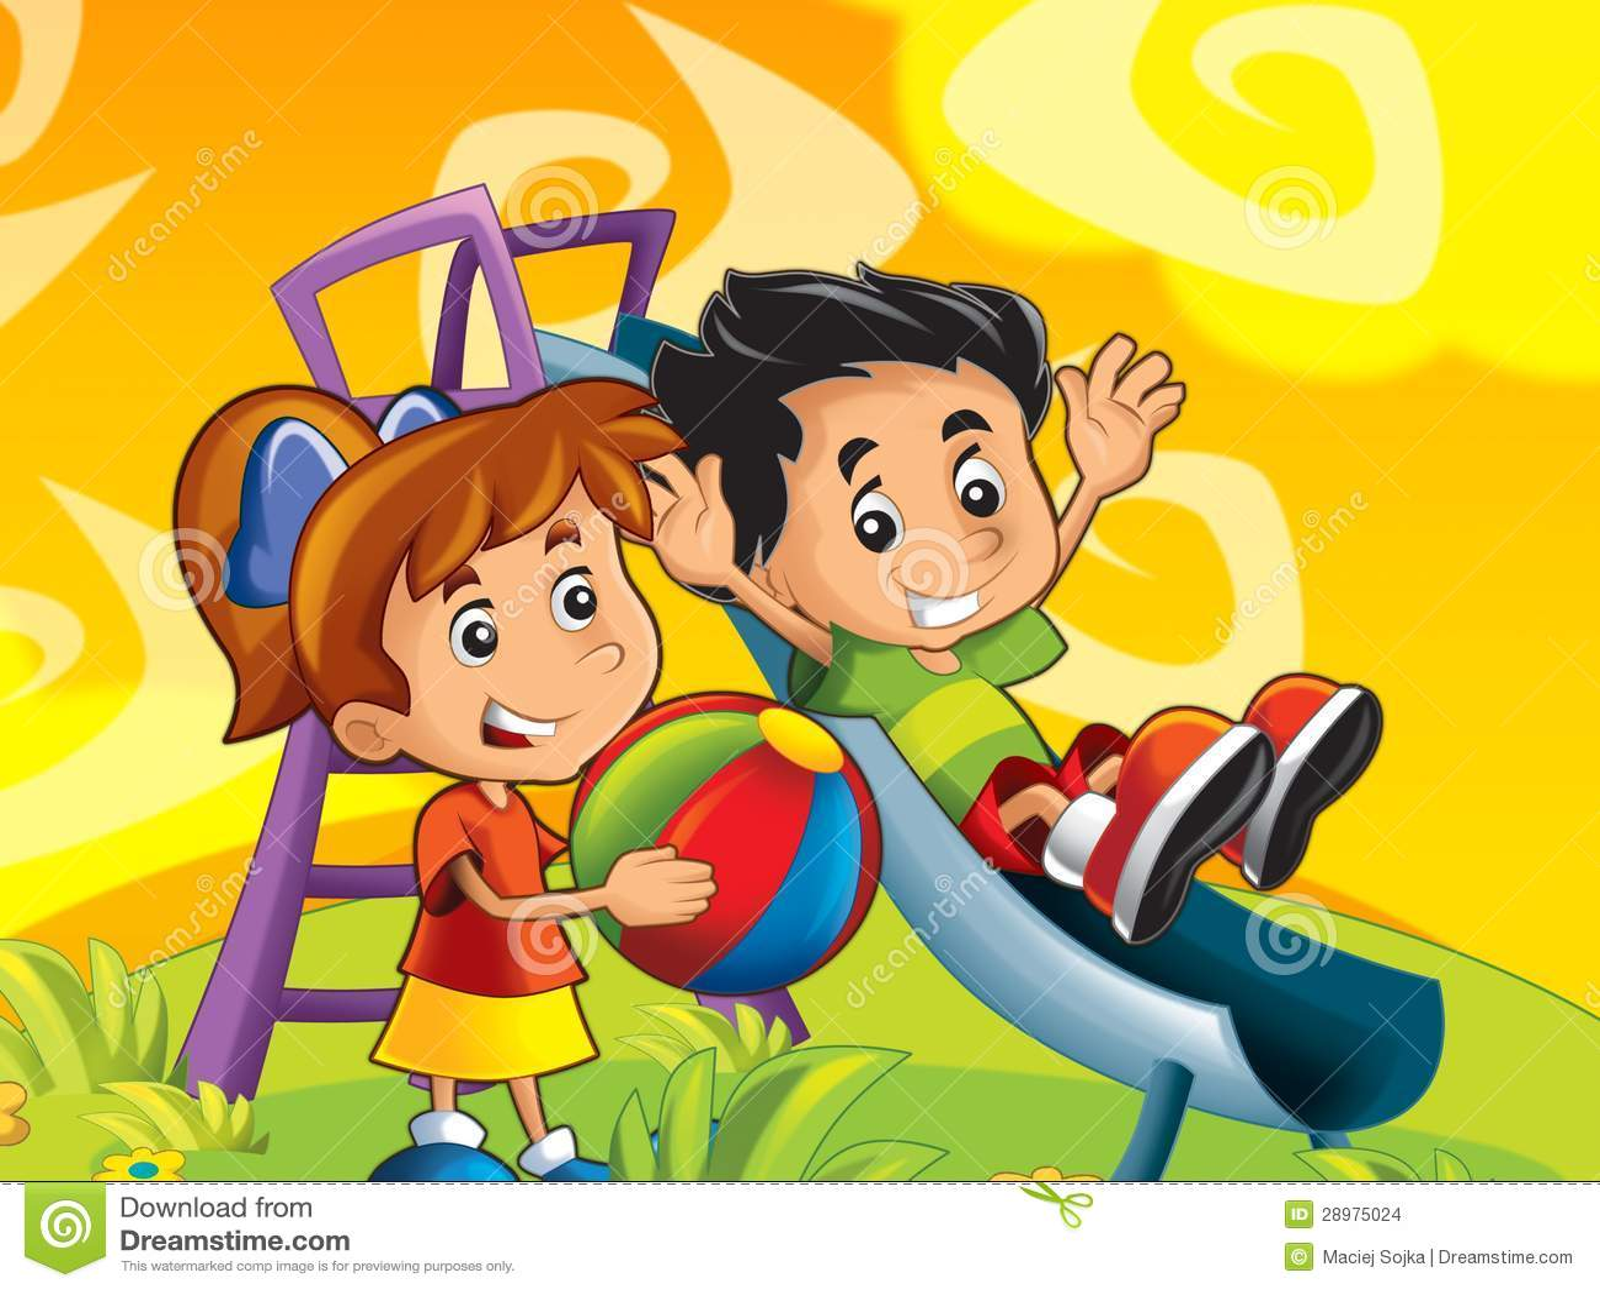 cartoon children - Cartoon Pictures For Kids